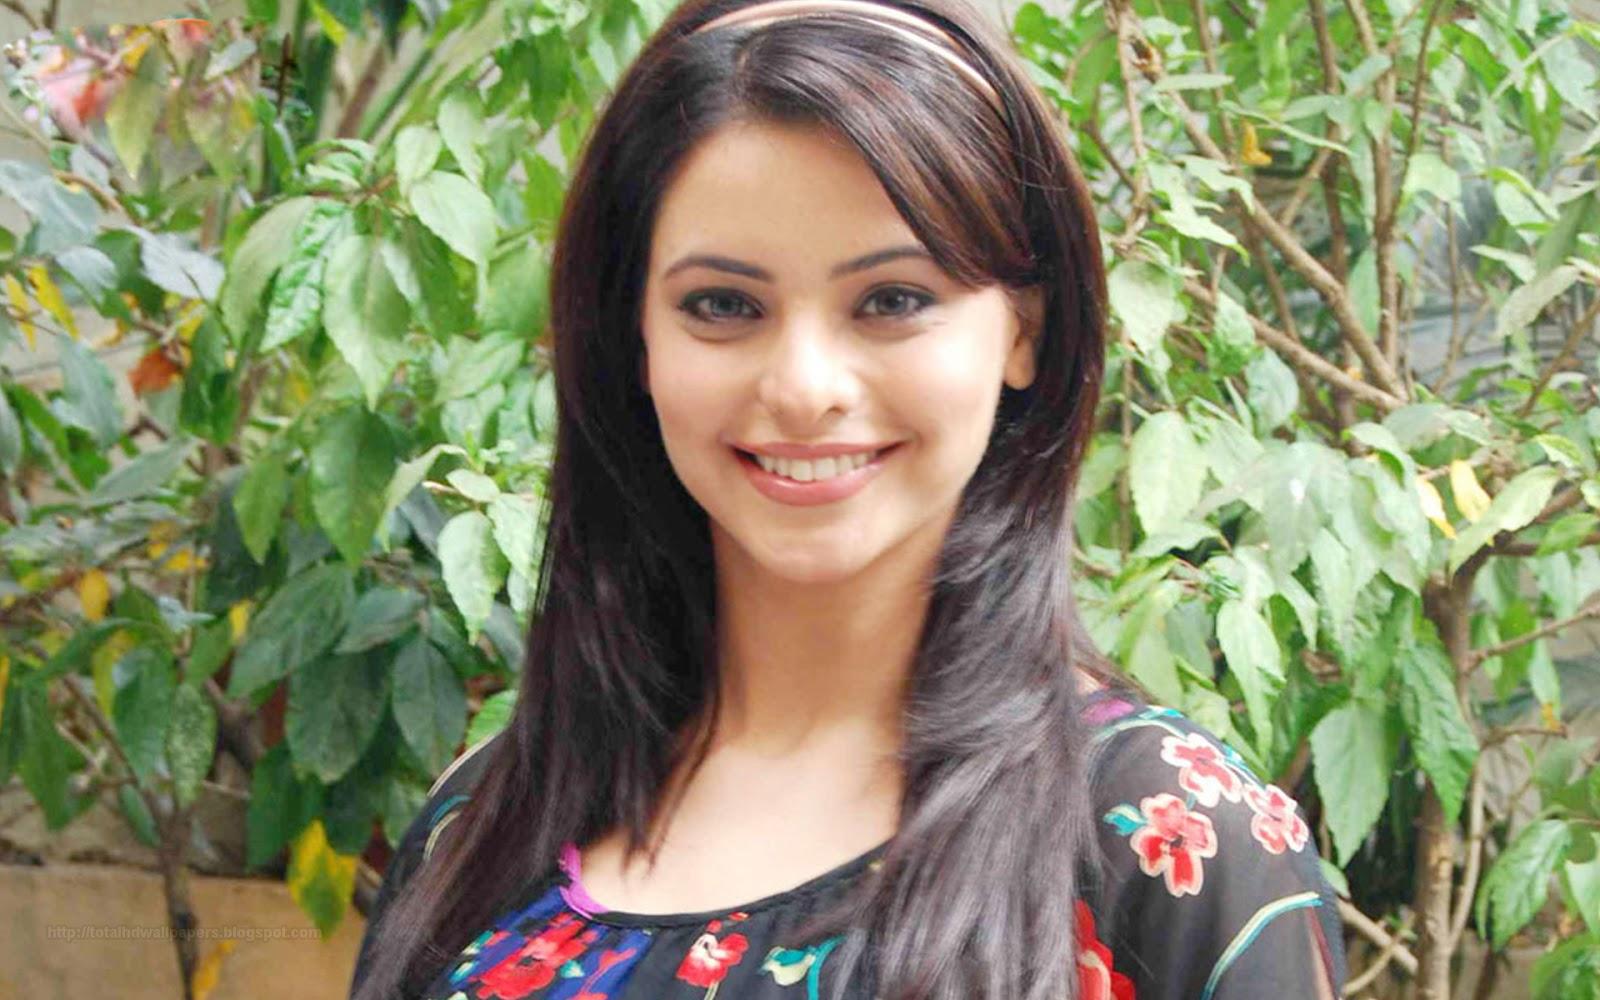 Simple Girl Wallpaper Pakistani Hd Wallpapers Bollywood Actress Hd Wallpapers 1080p